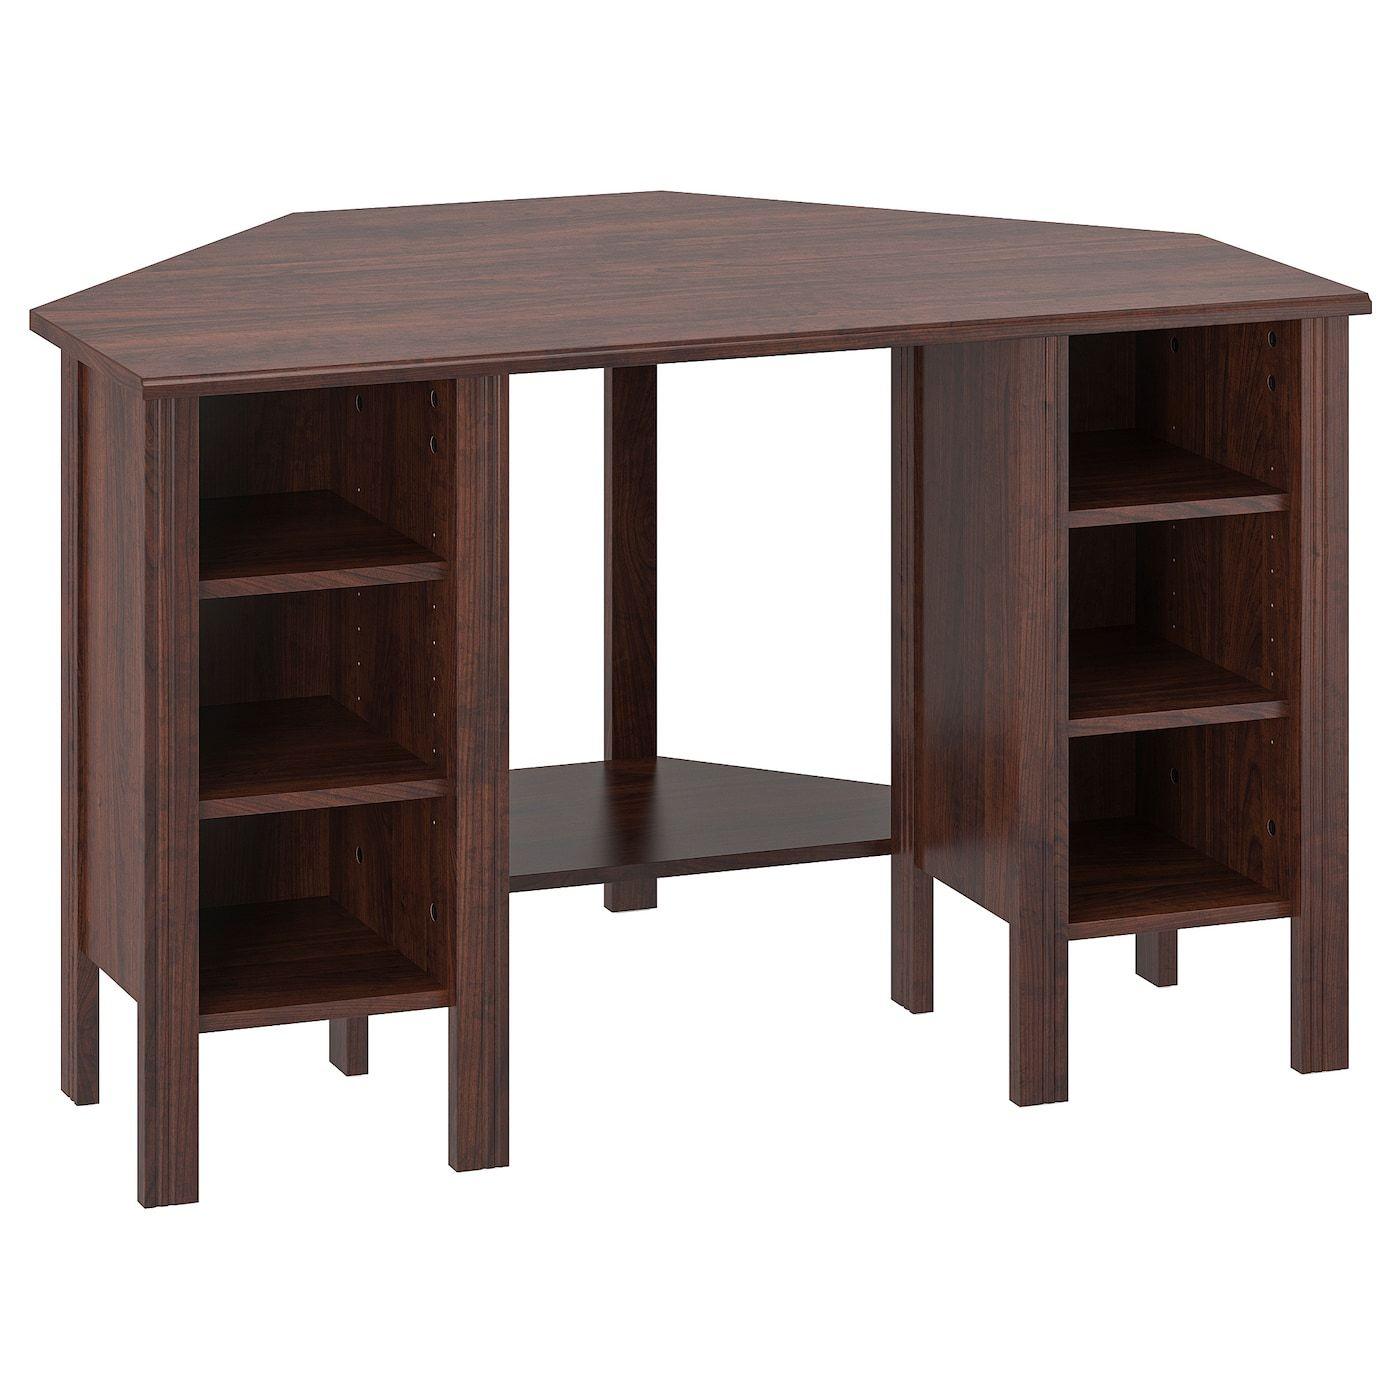 Brusali Corner Desk Brown 47 1 4x28 3 4 Ikea Desk Corner